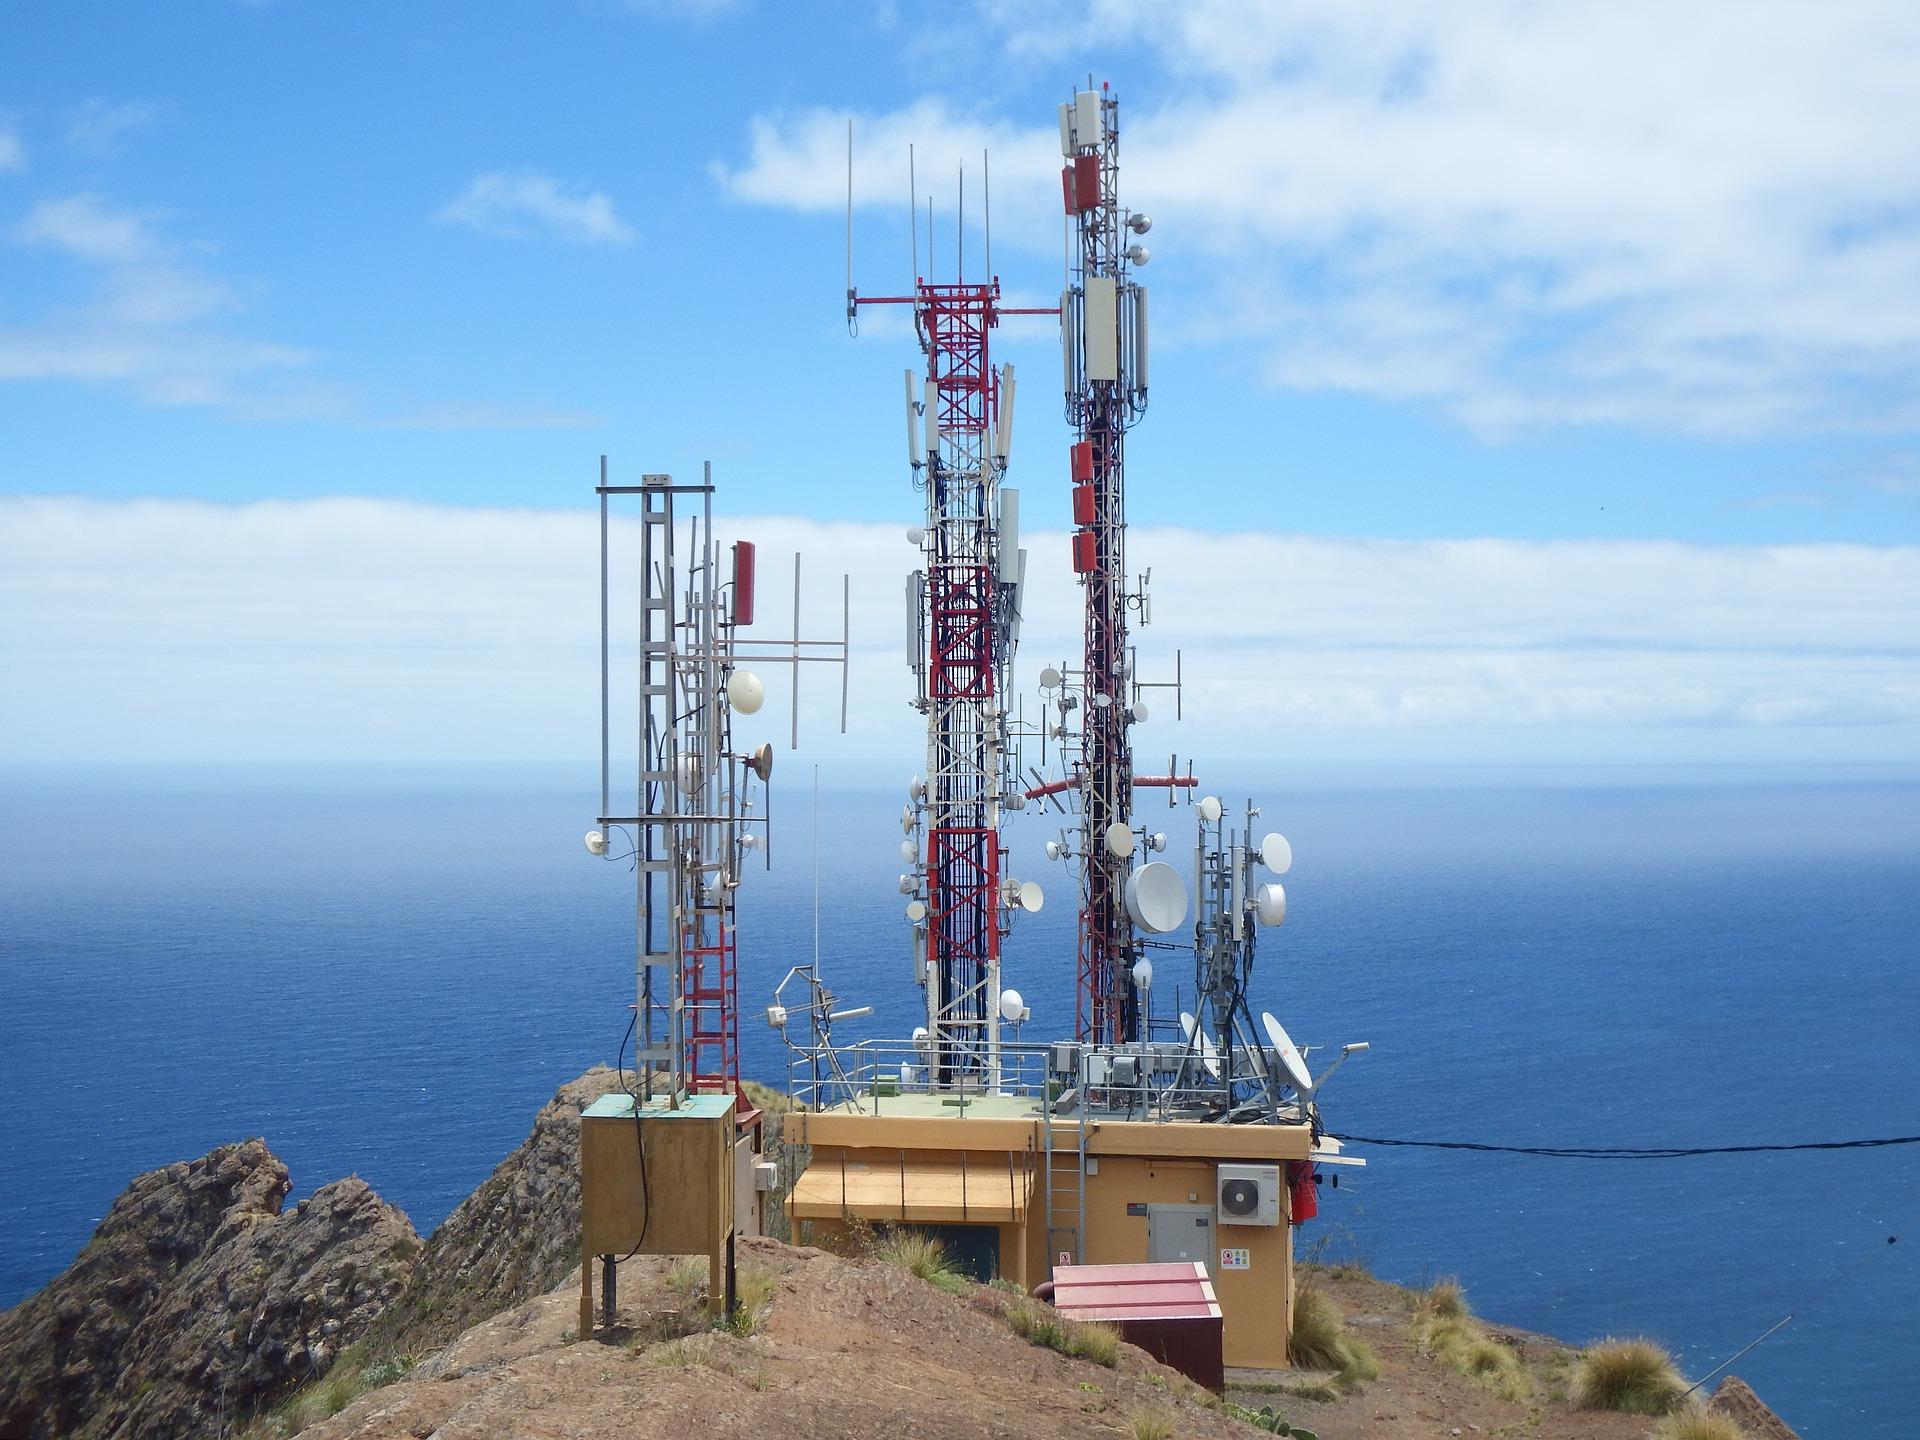 antenna-5357958_1920.jpg